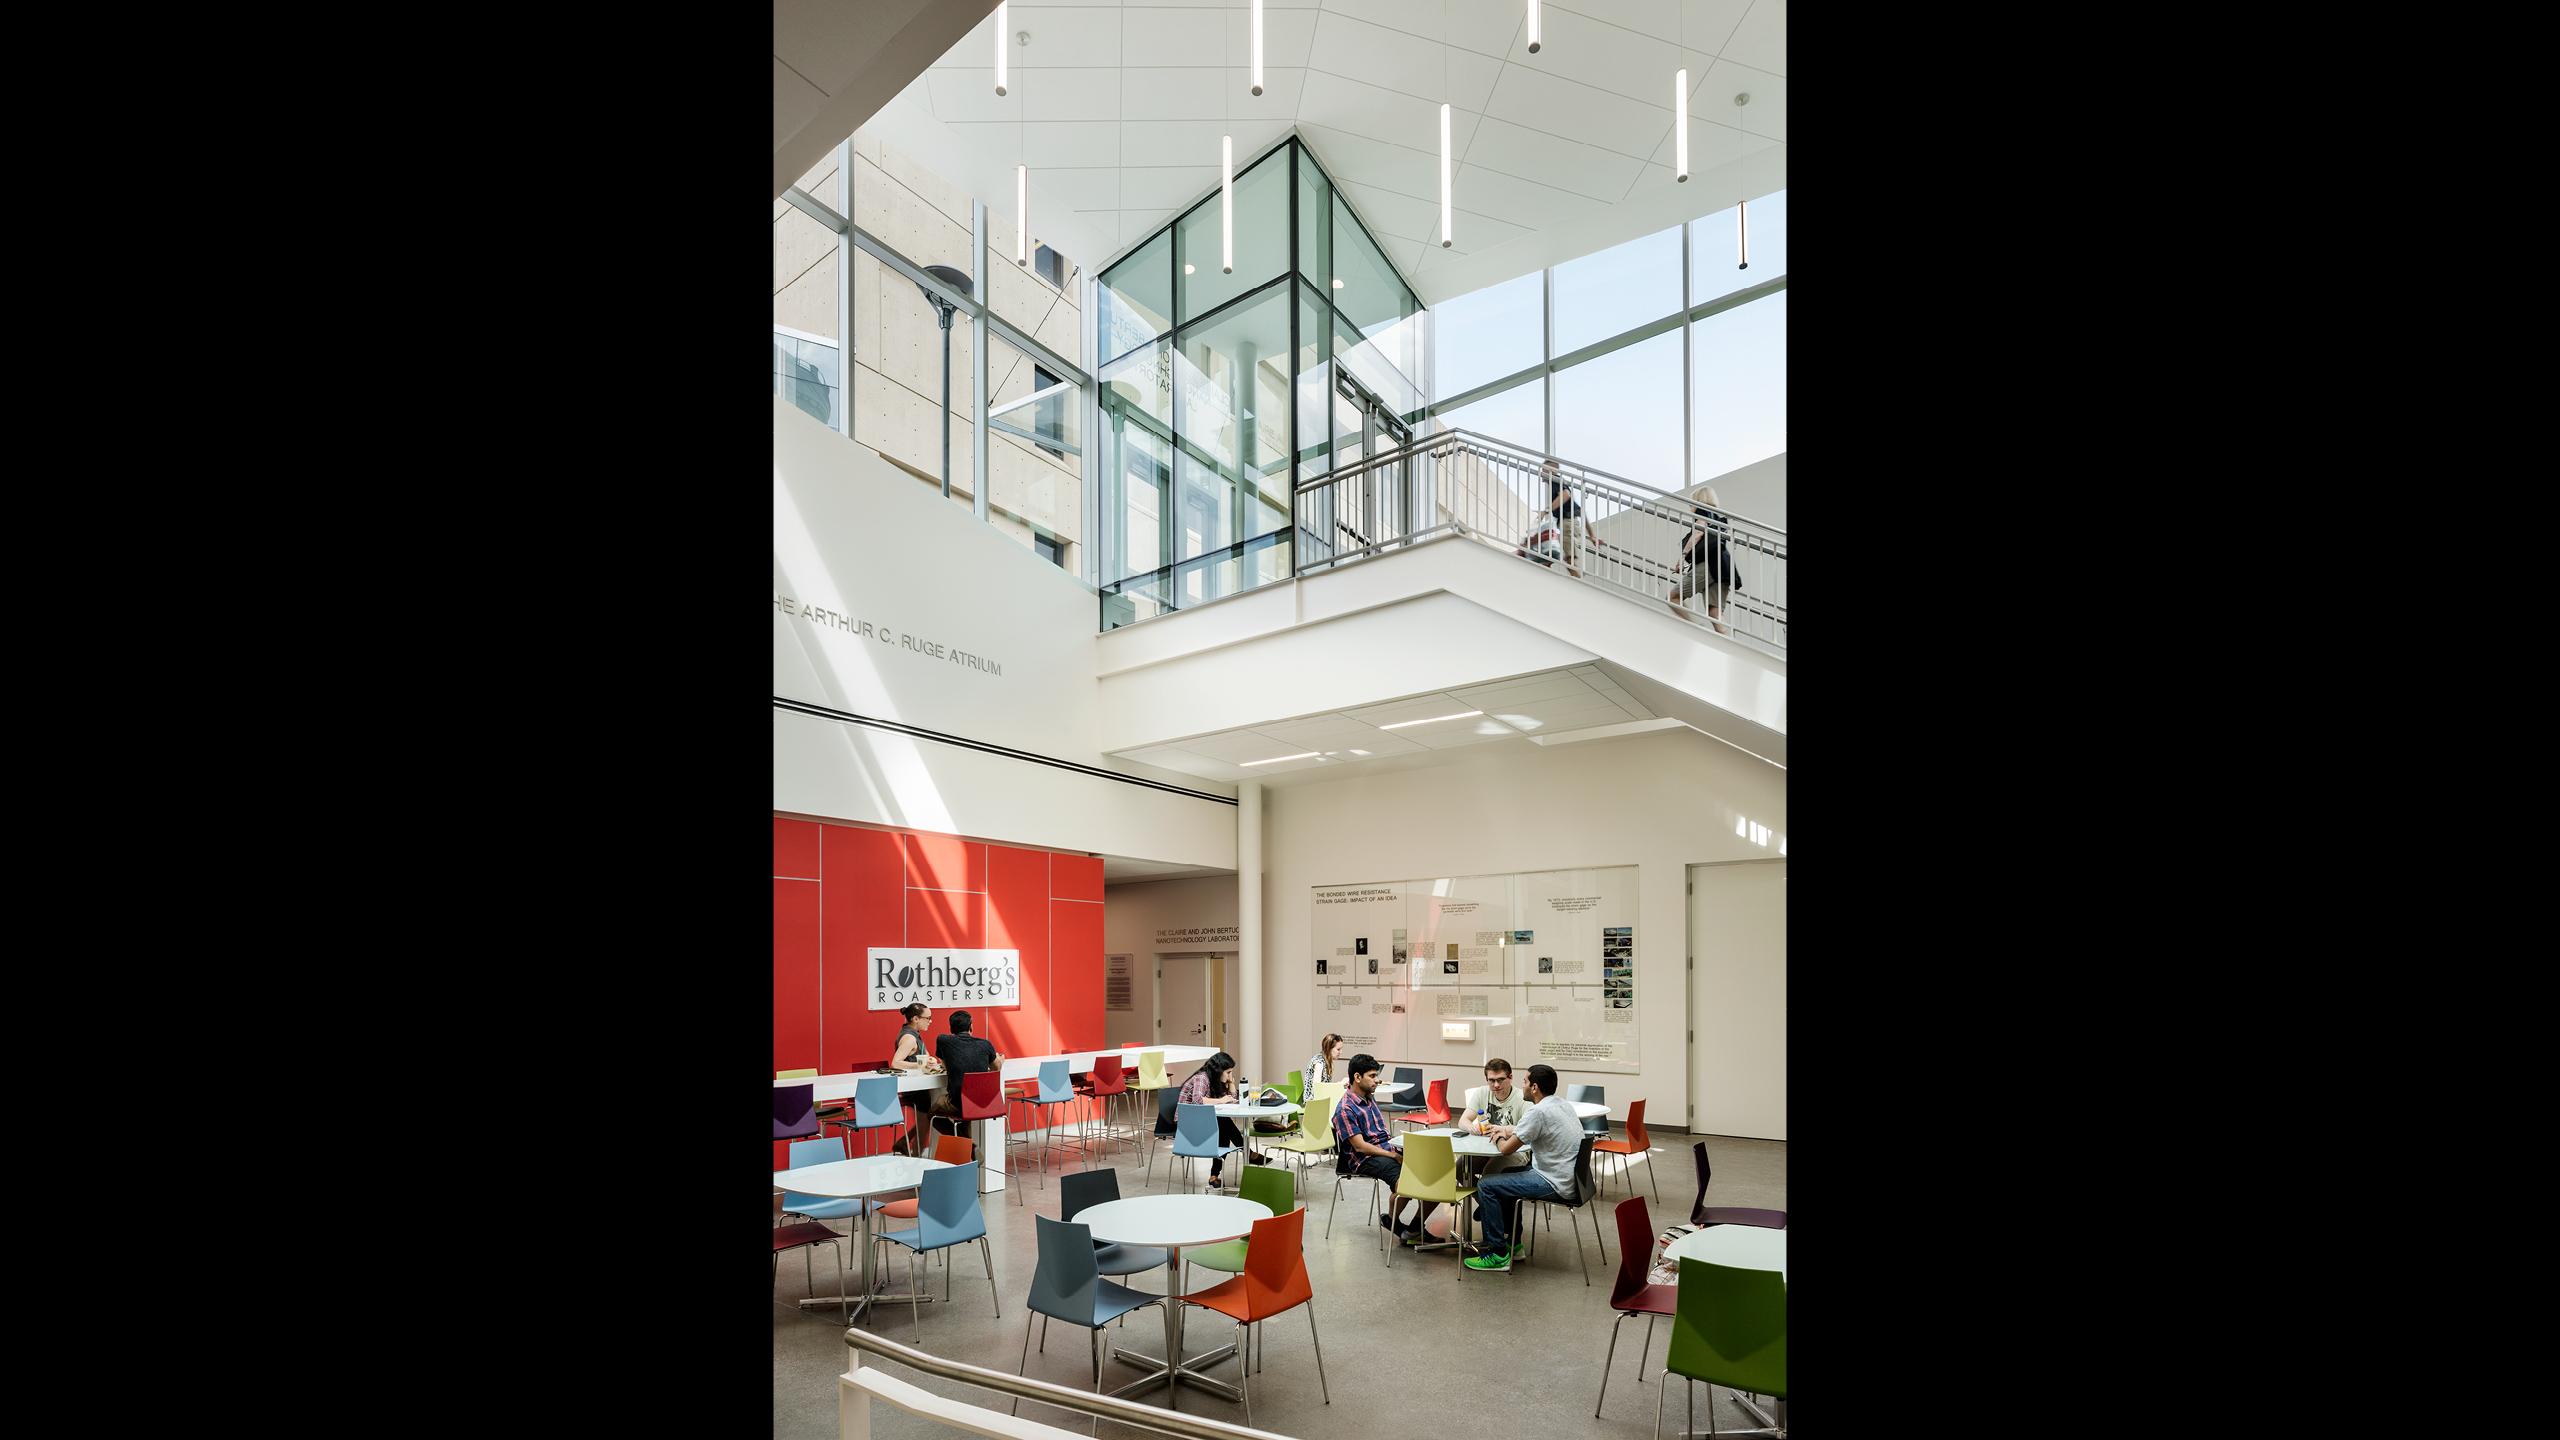 Storytelling, Artwork, Graphic and Display Design: Scott Hall at Carnegie Mellon University / image 4